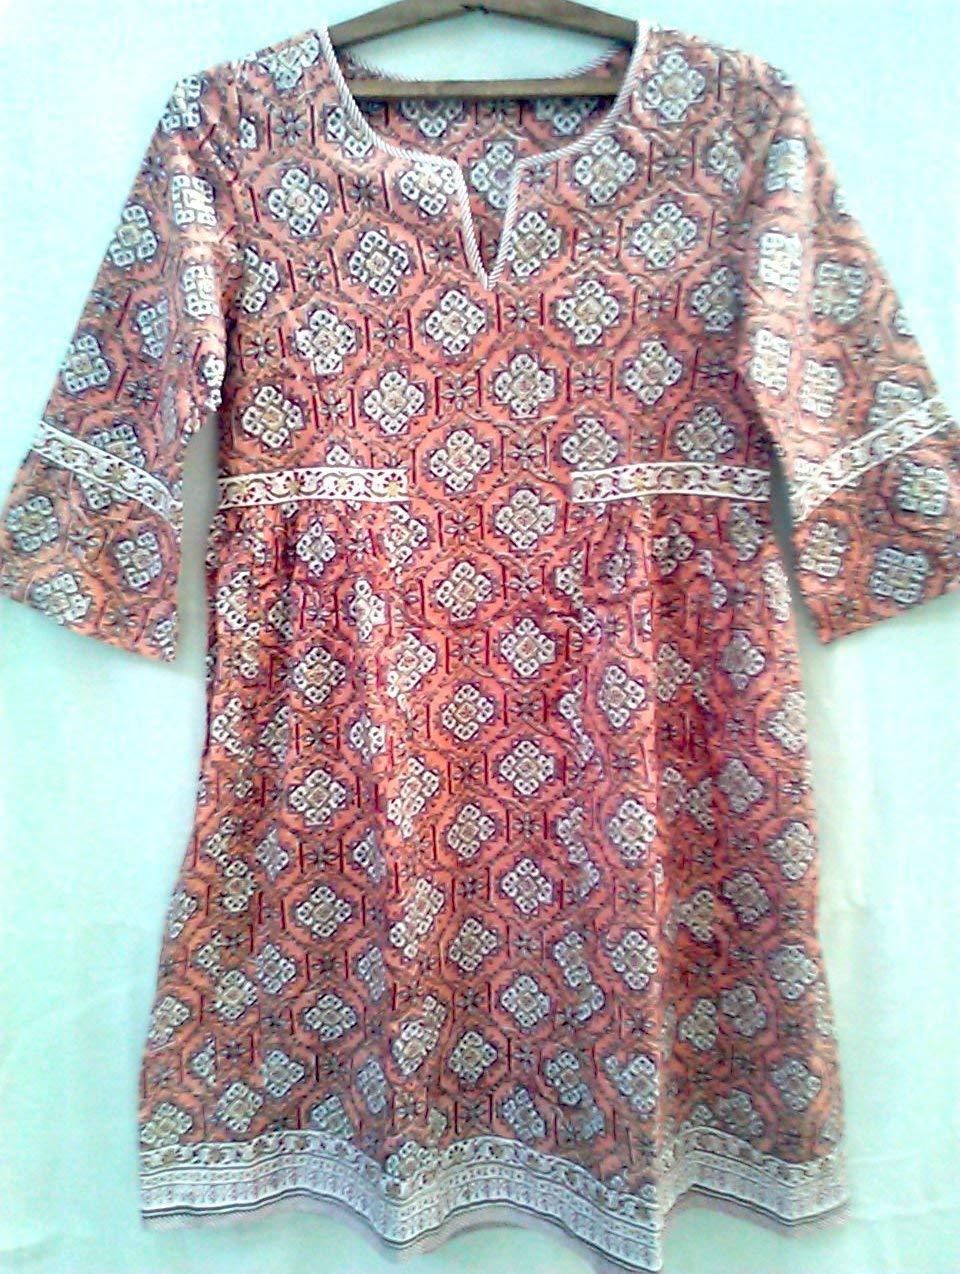 Coral Salmon & Maroon Jali style Anokhi Hand block print Indian cotton Boho chic Tunic dress